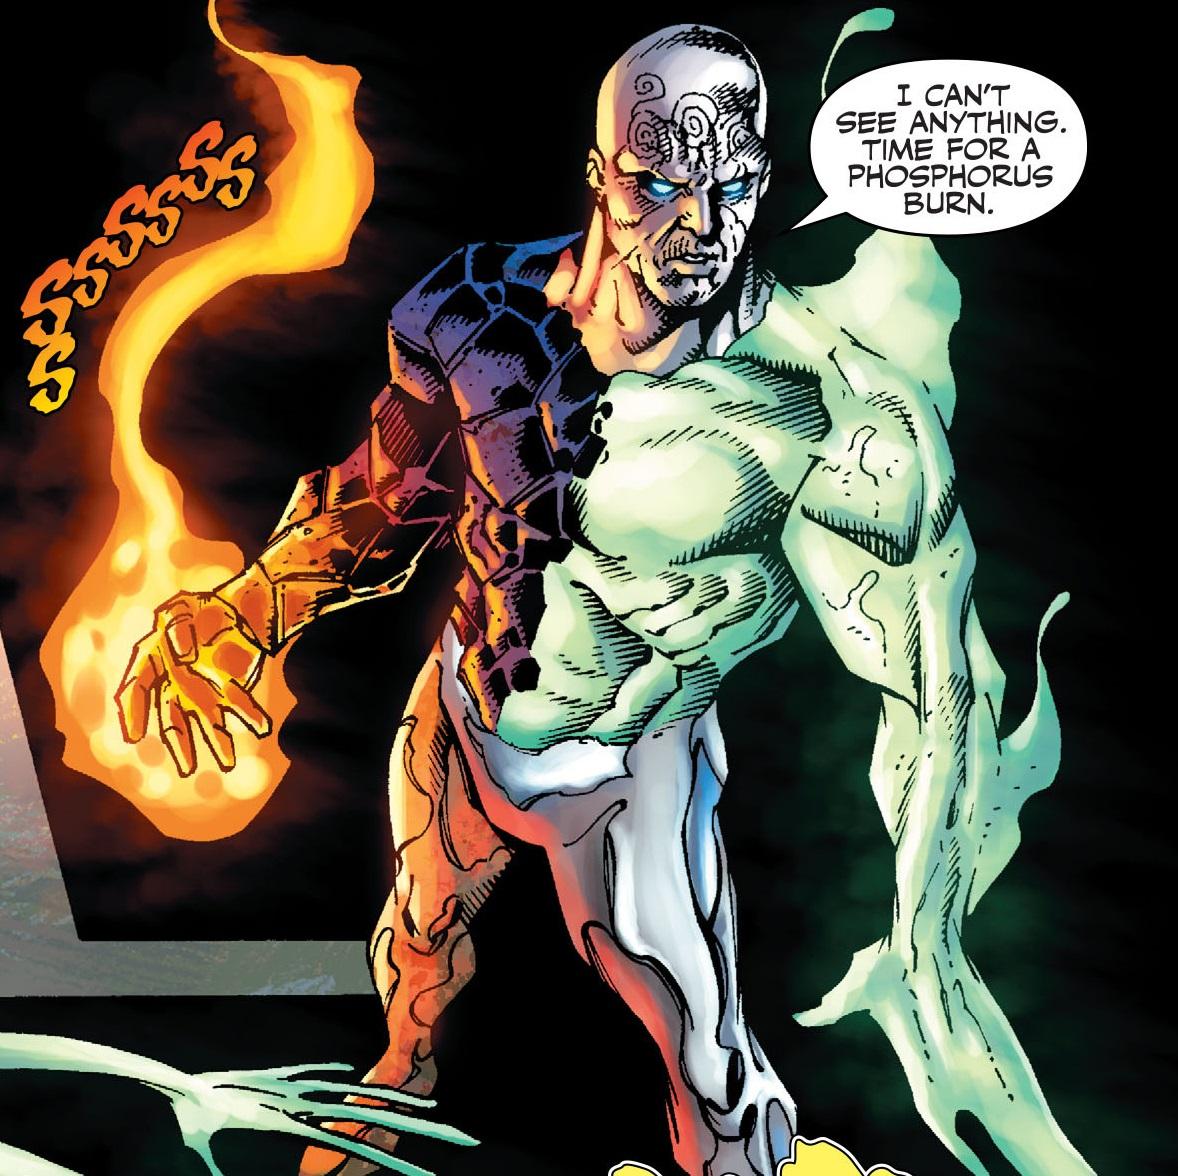 Metamorpho Vol 2 3 | DC Database | Fandom powered by Wikia